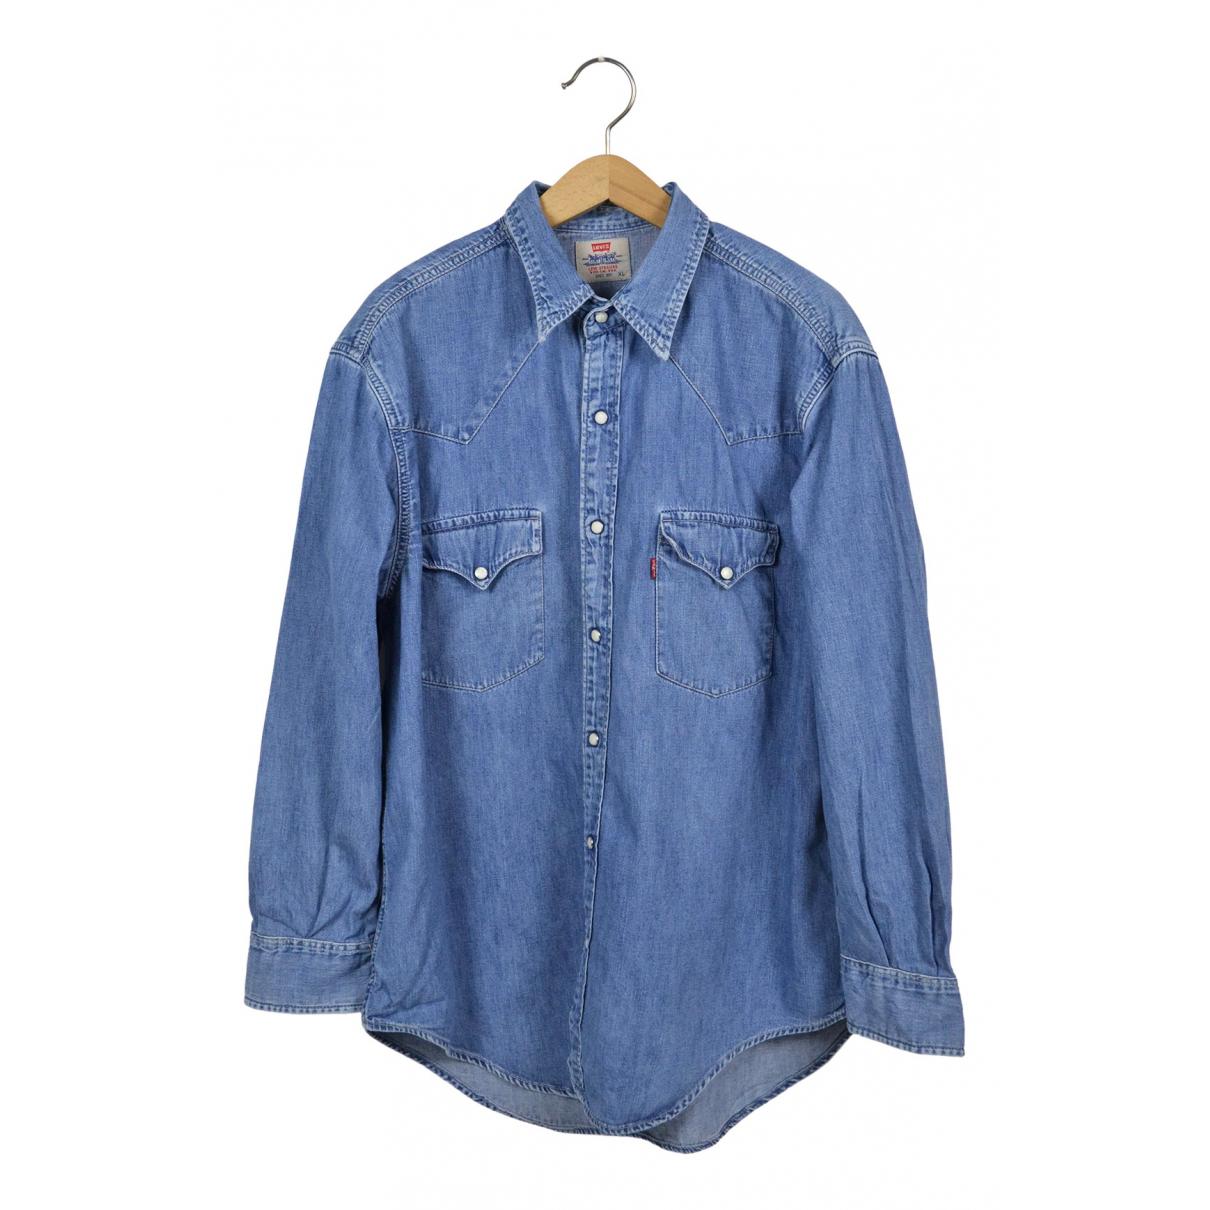 Levis \N Hemden in  Blau Denim - Jeans